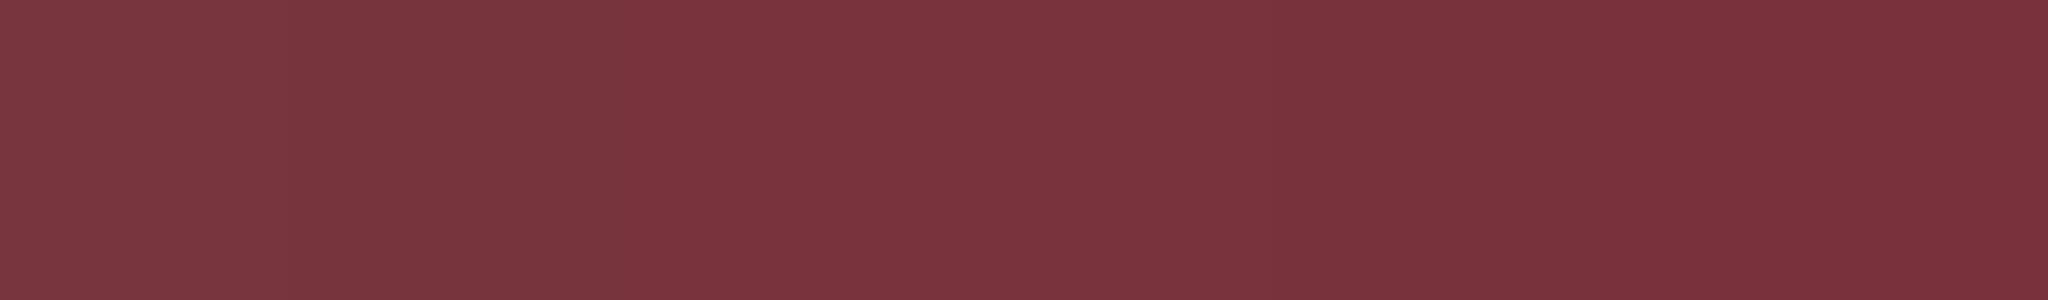 HU 13750 ABS Kante Dunkelrot glatt Glanzgrad 90°